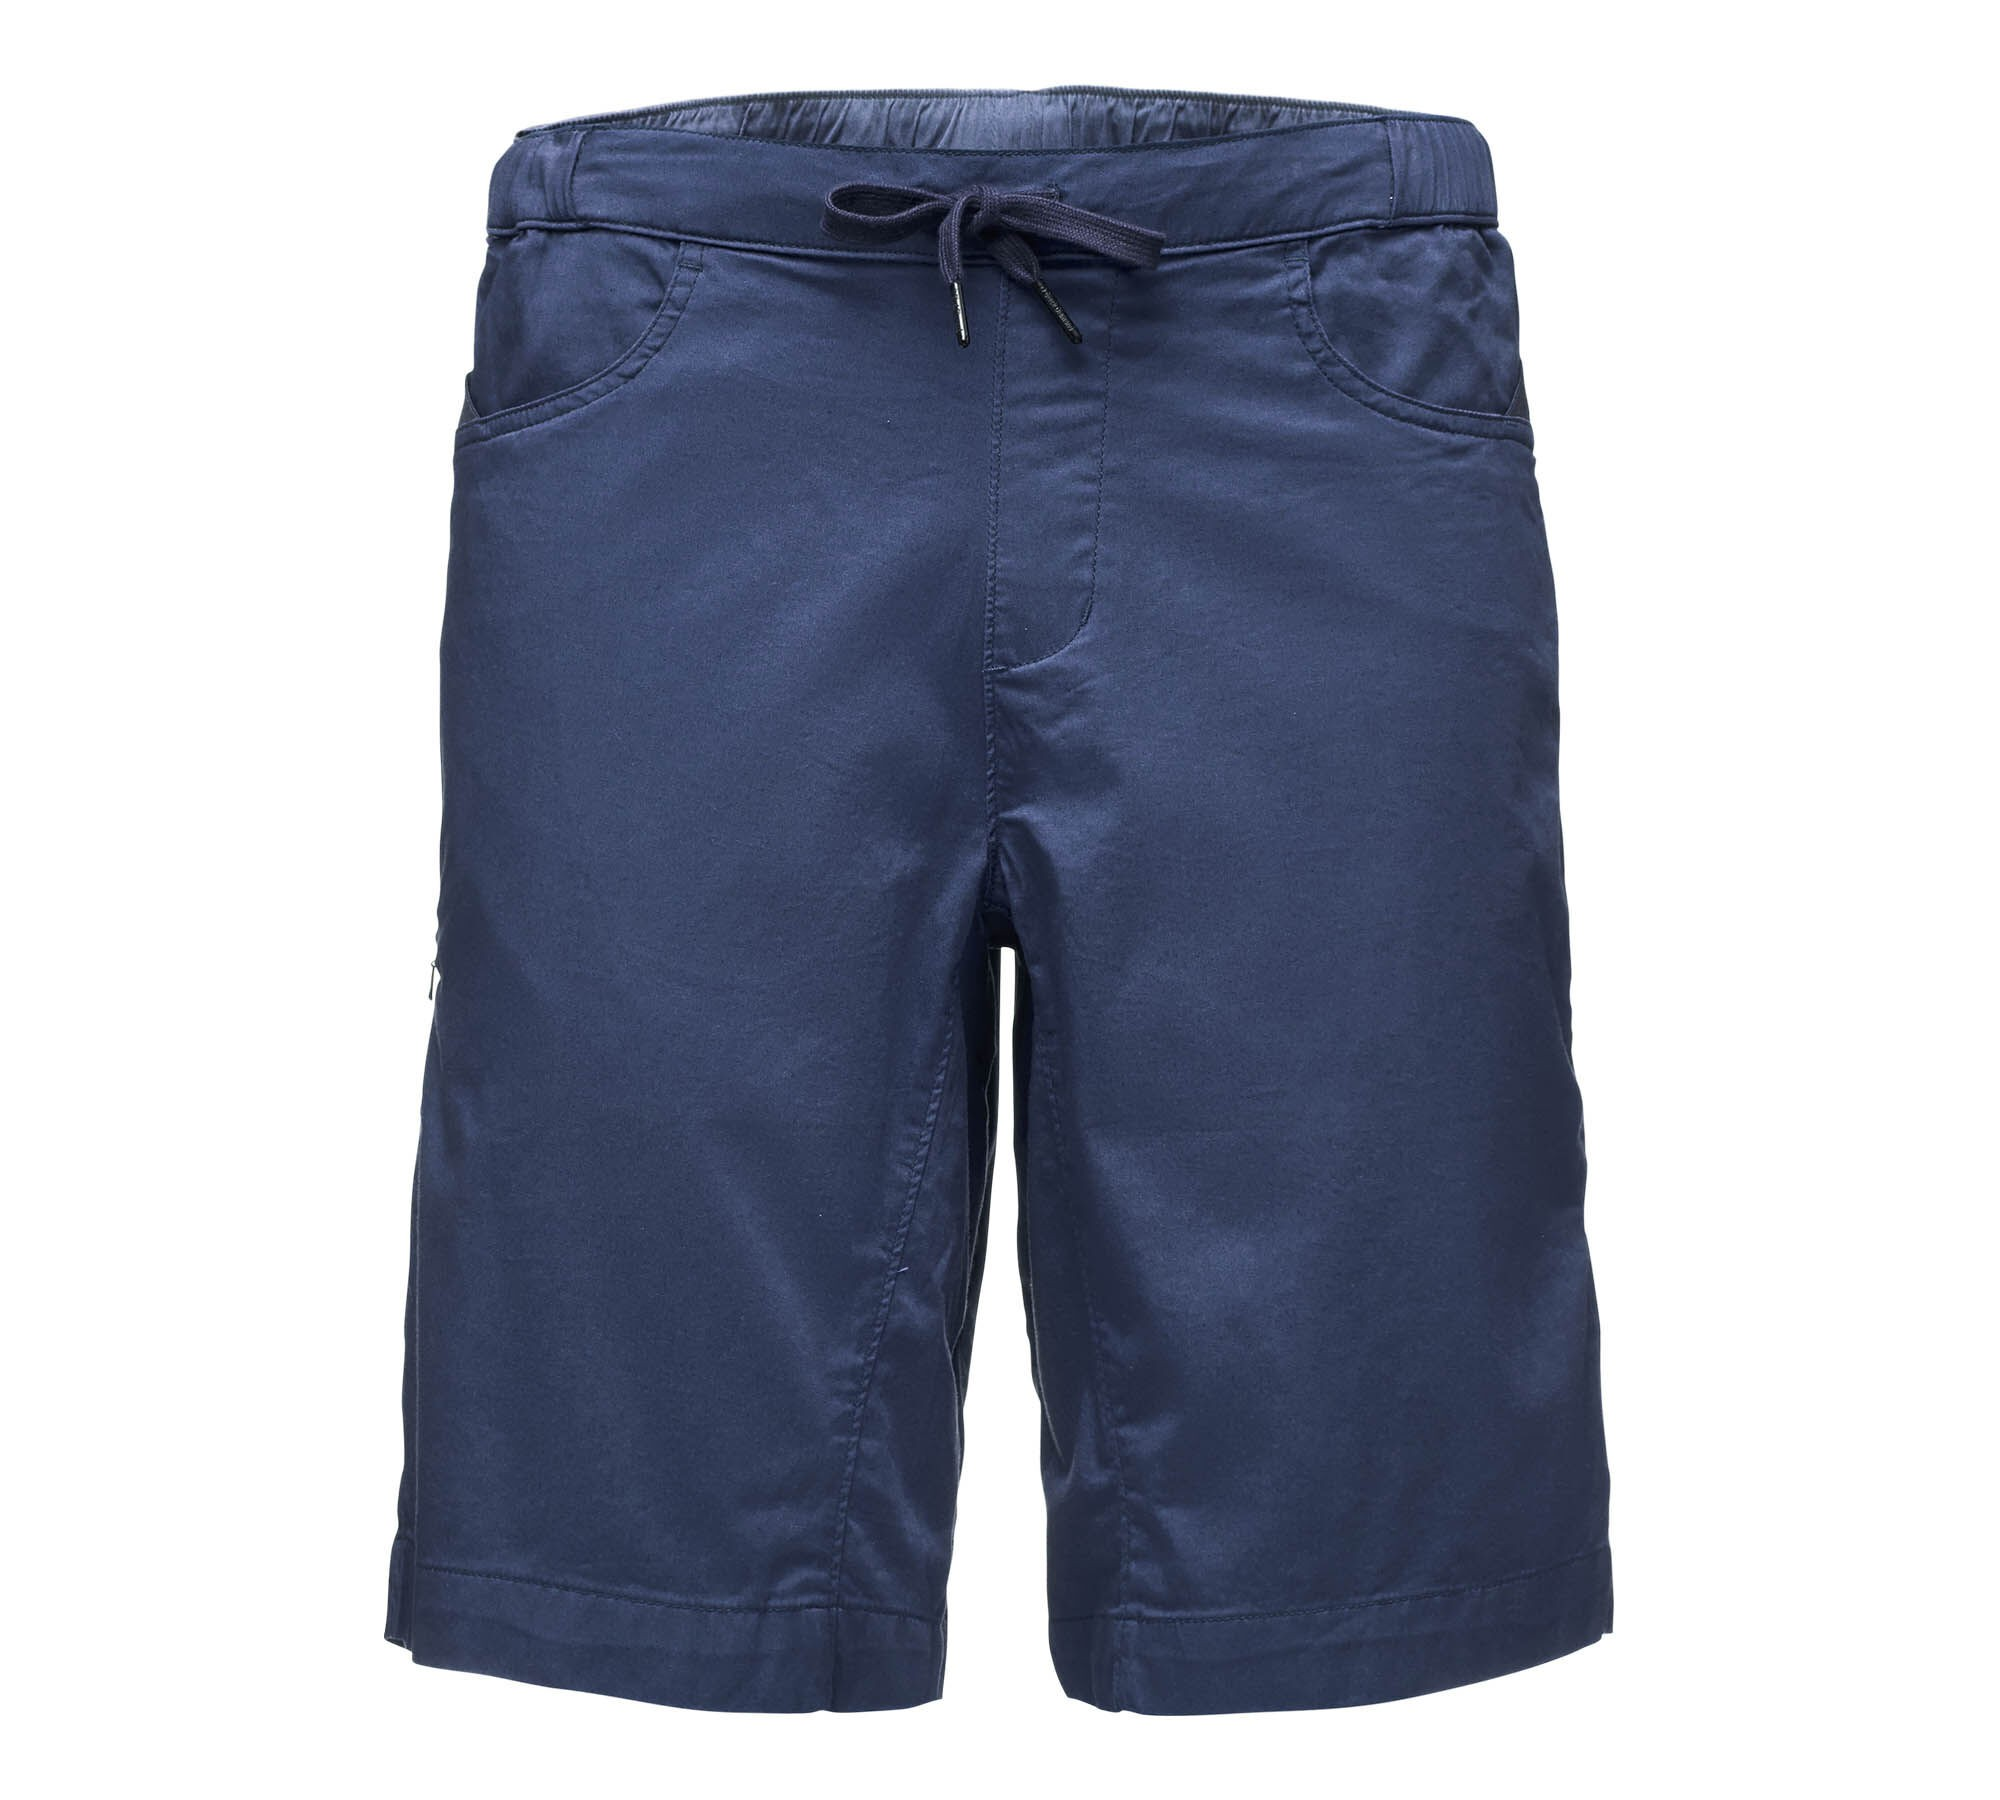 Black Diamond Notion Shorts - Climbing shorts - Men's